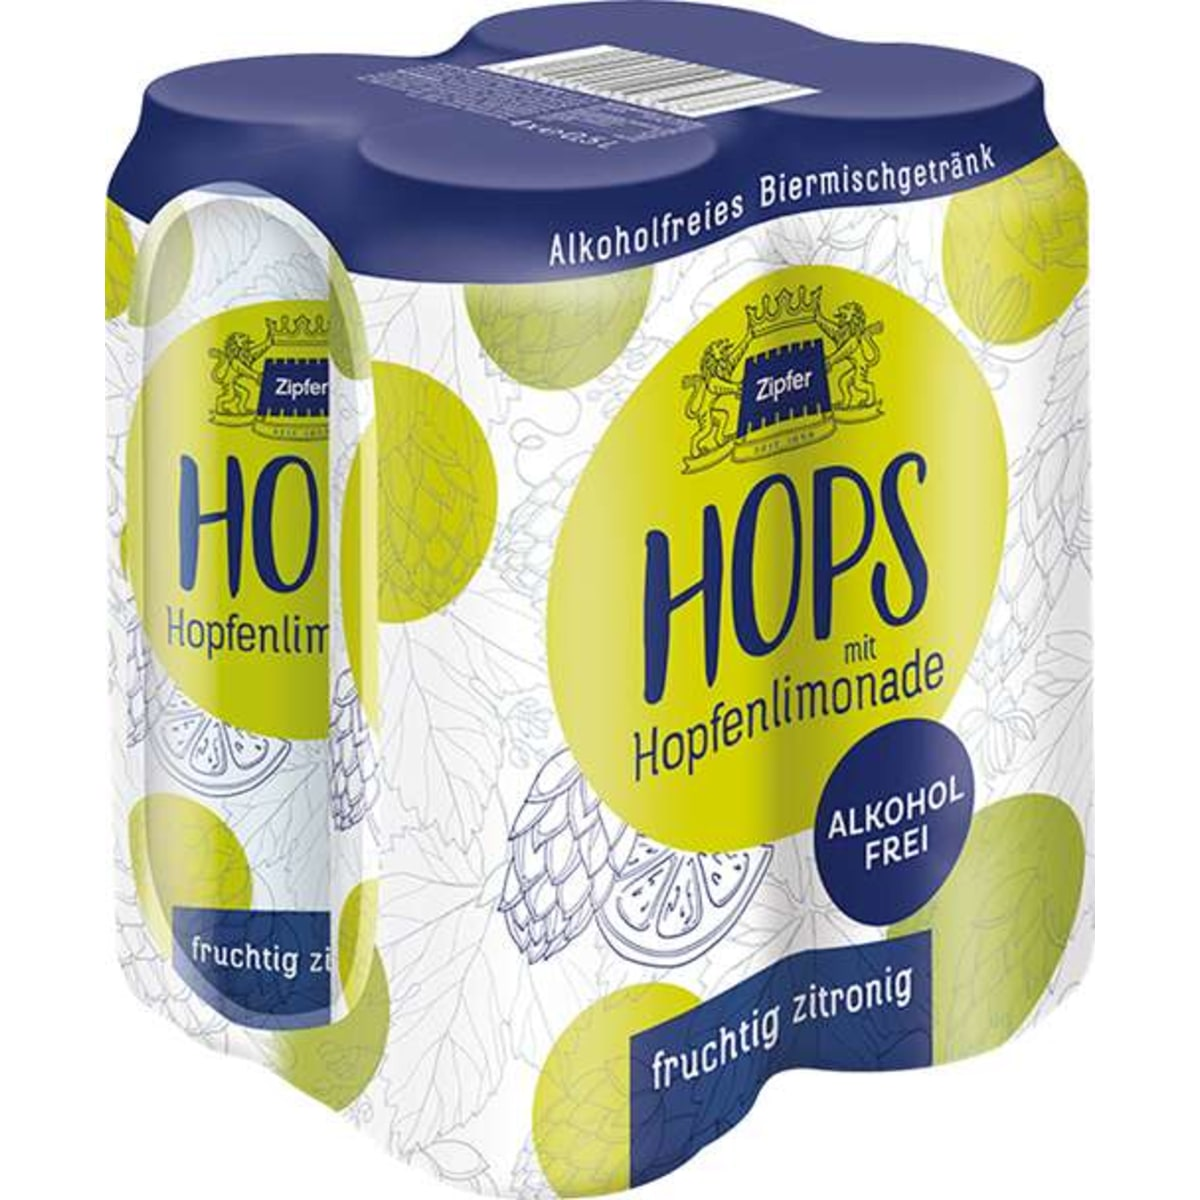 Zipfer Hops 4x0,5l Dose